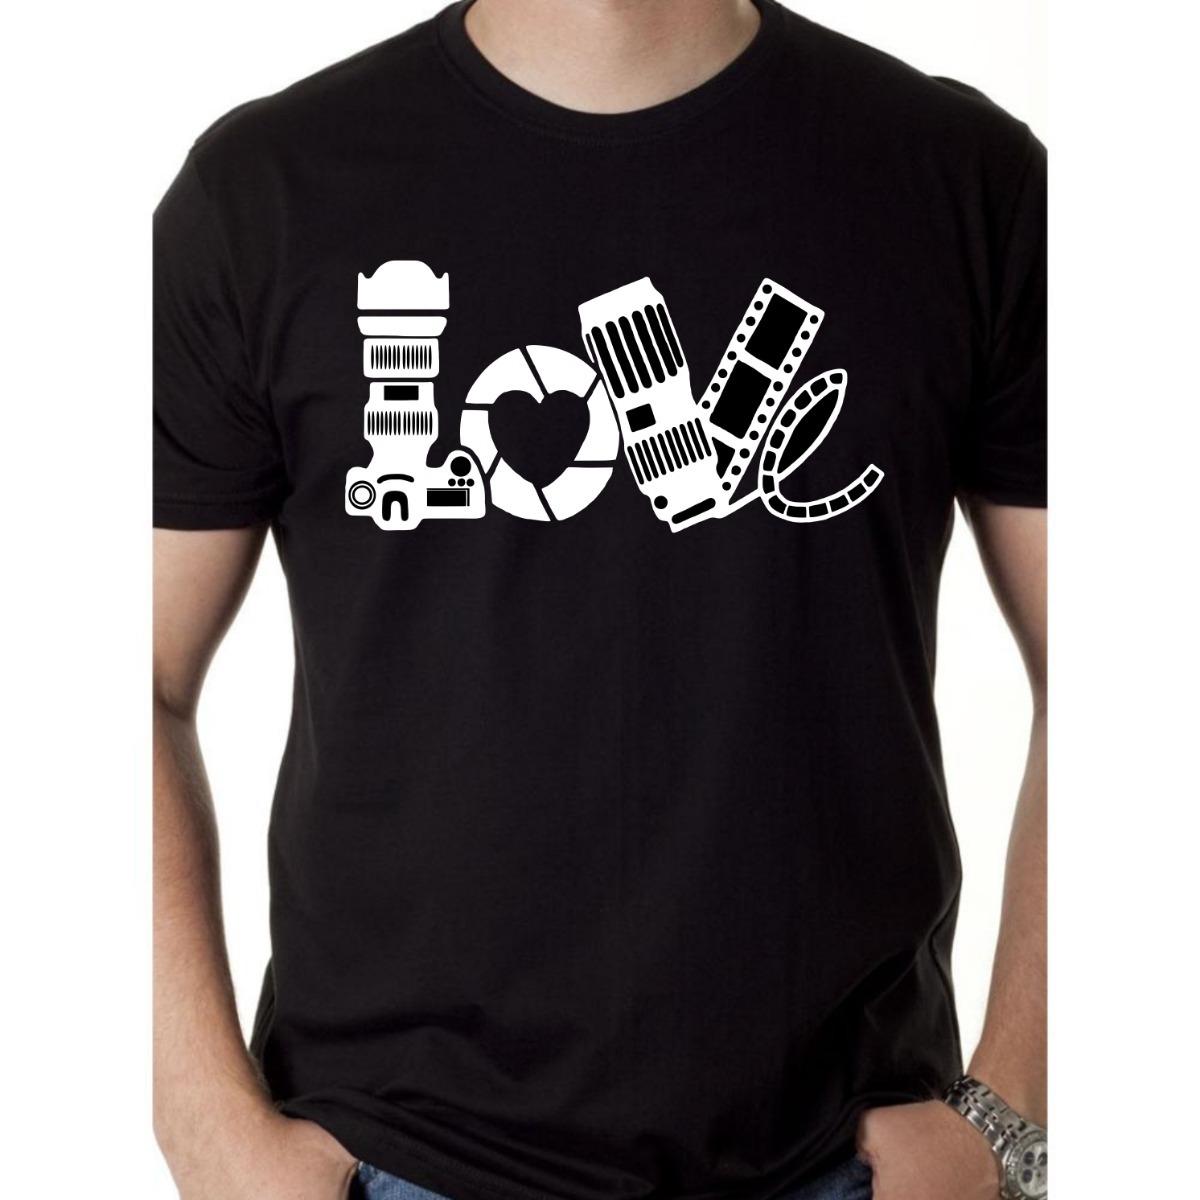 653a899f5d 3 camiseta personalizada love fotografia. Carregando zoom.